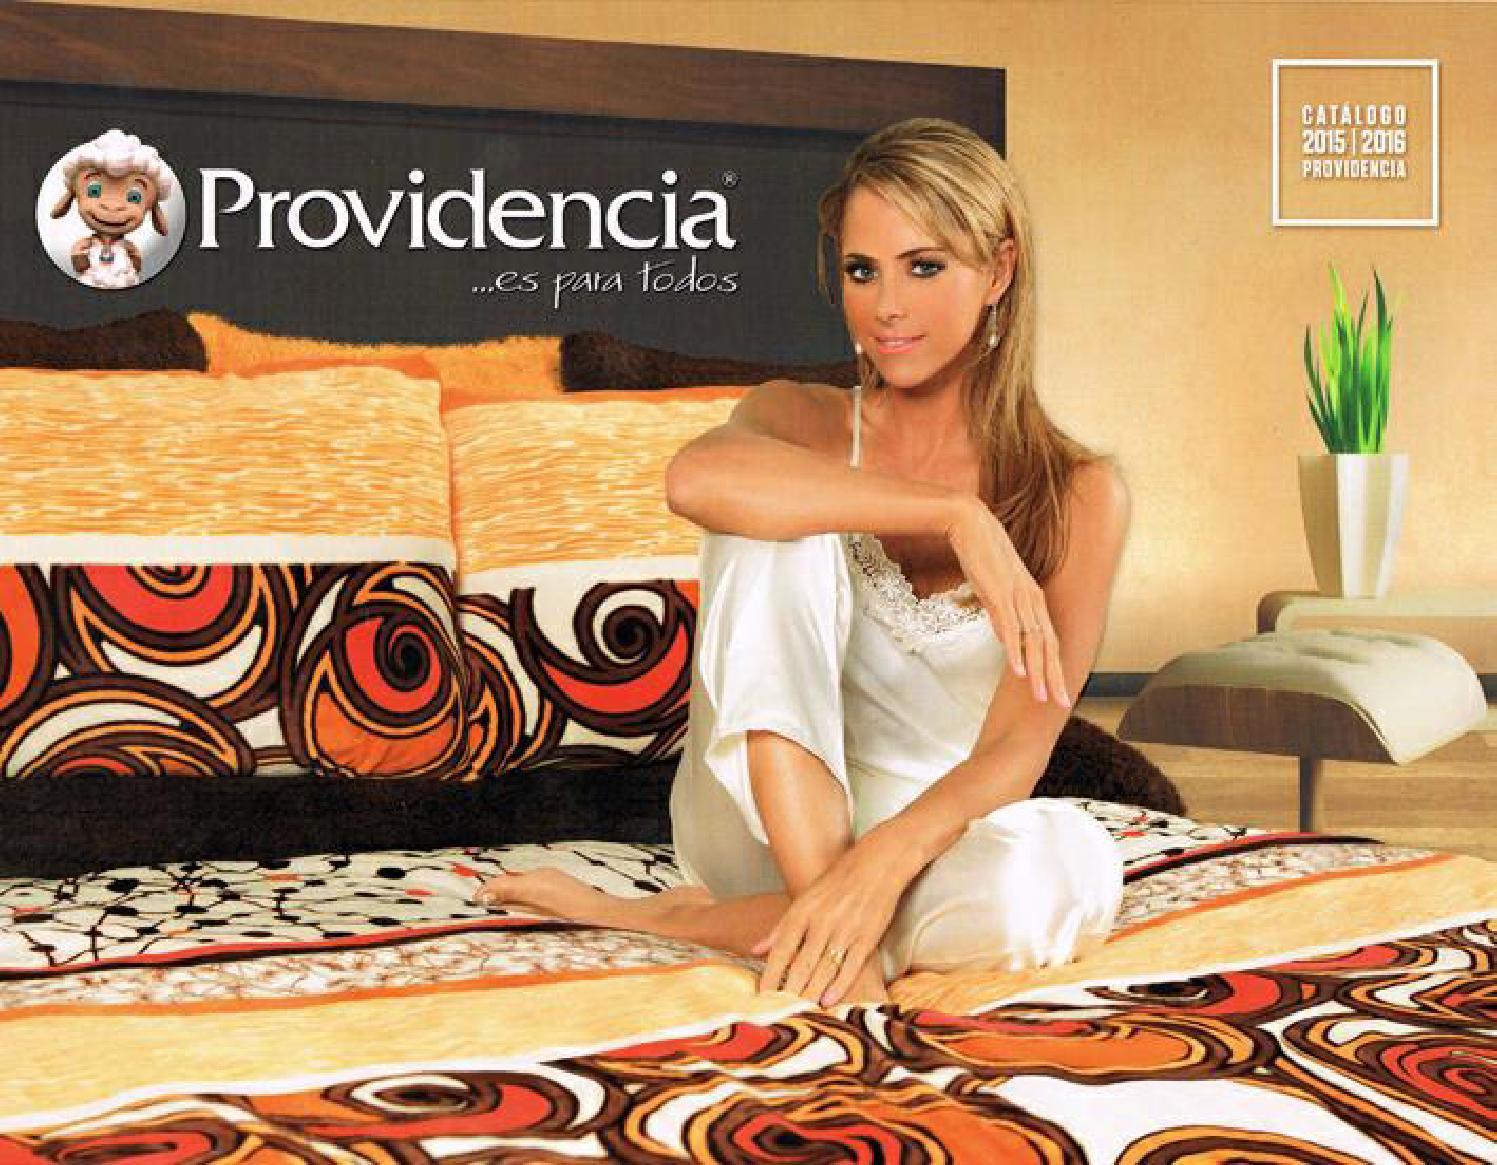 Catalogo cobertores providencia 2015 2016 by www for Catalogo bricoman 2015